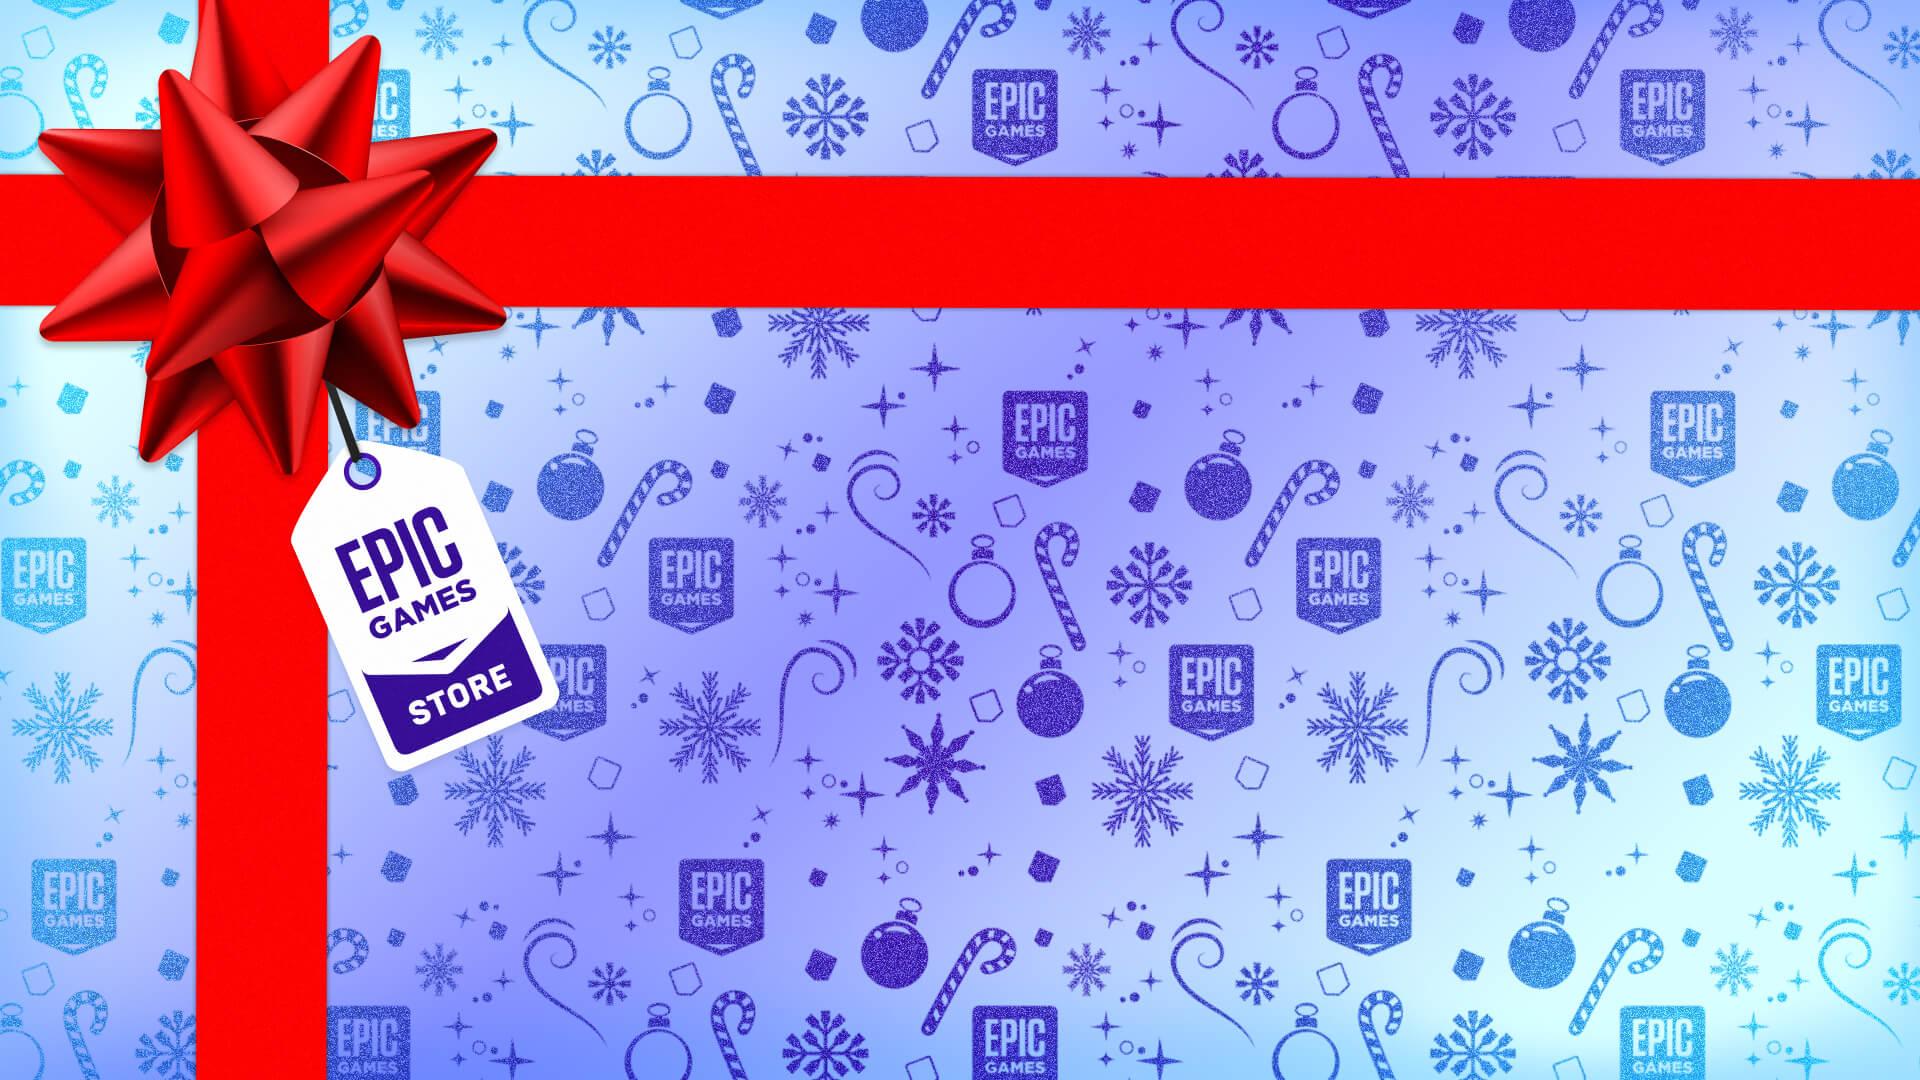 egs-holidaysale2020-announce-freegames-1920x1080-1920x1080-735965e6b810